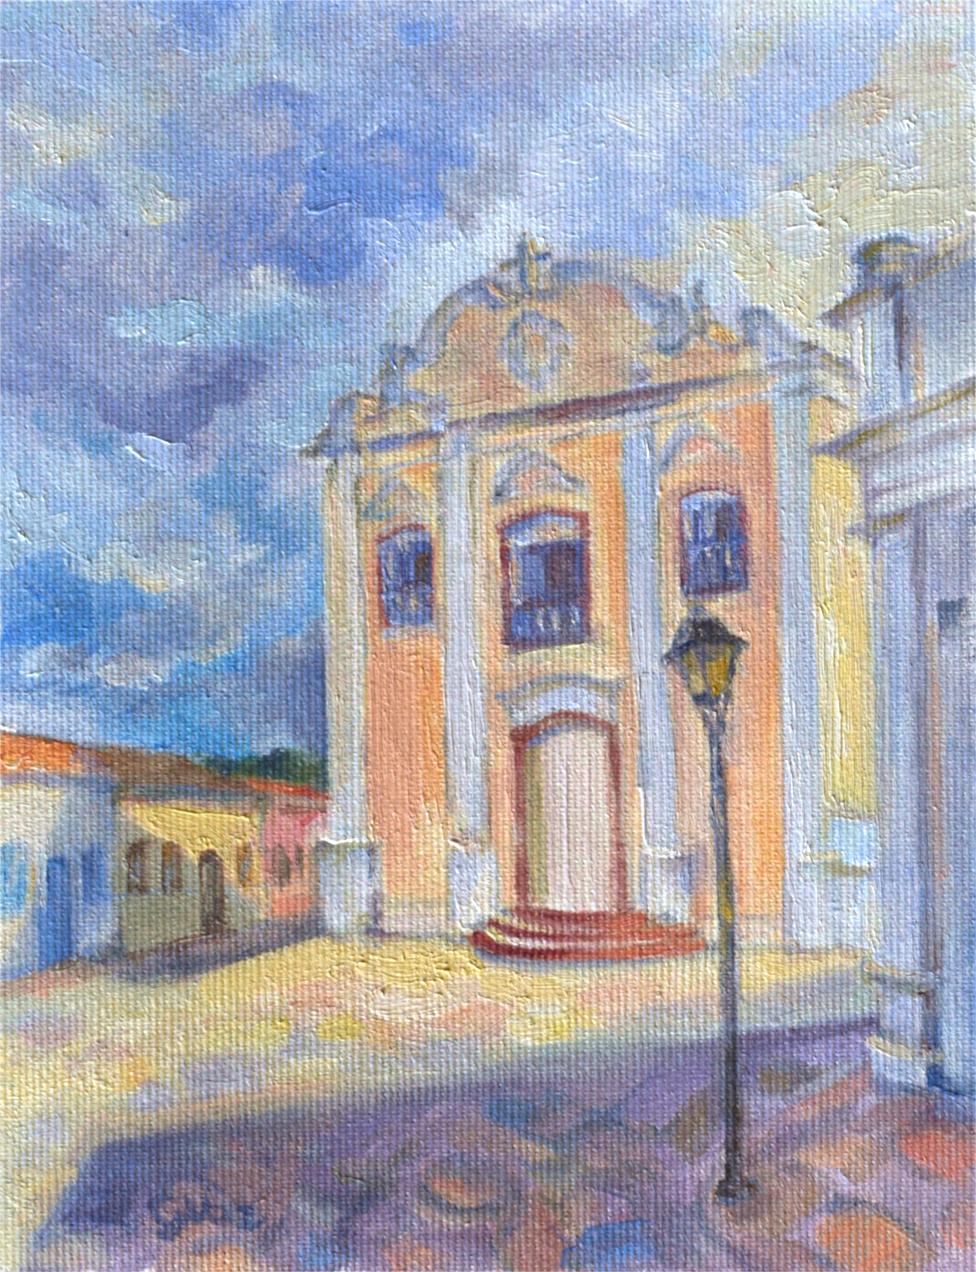 Igreja Nossa Senhora da Boa Morte, oil on canvas, 20 x 15 cm, 2020